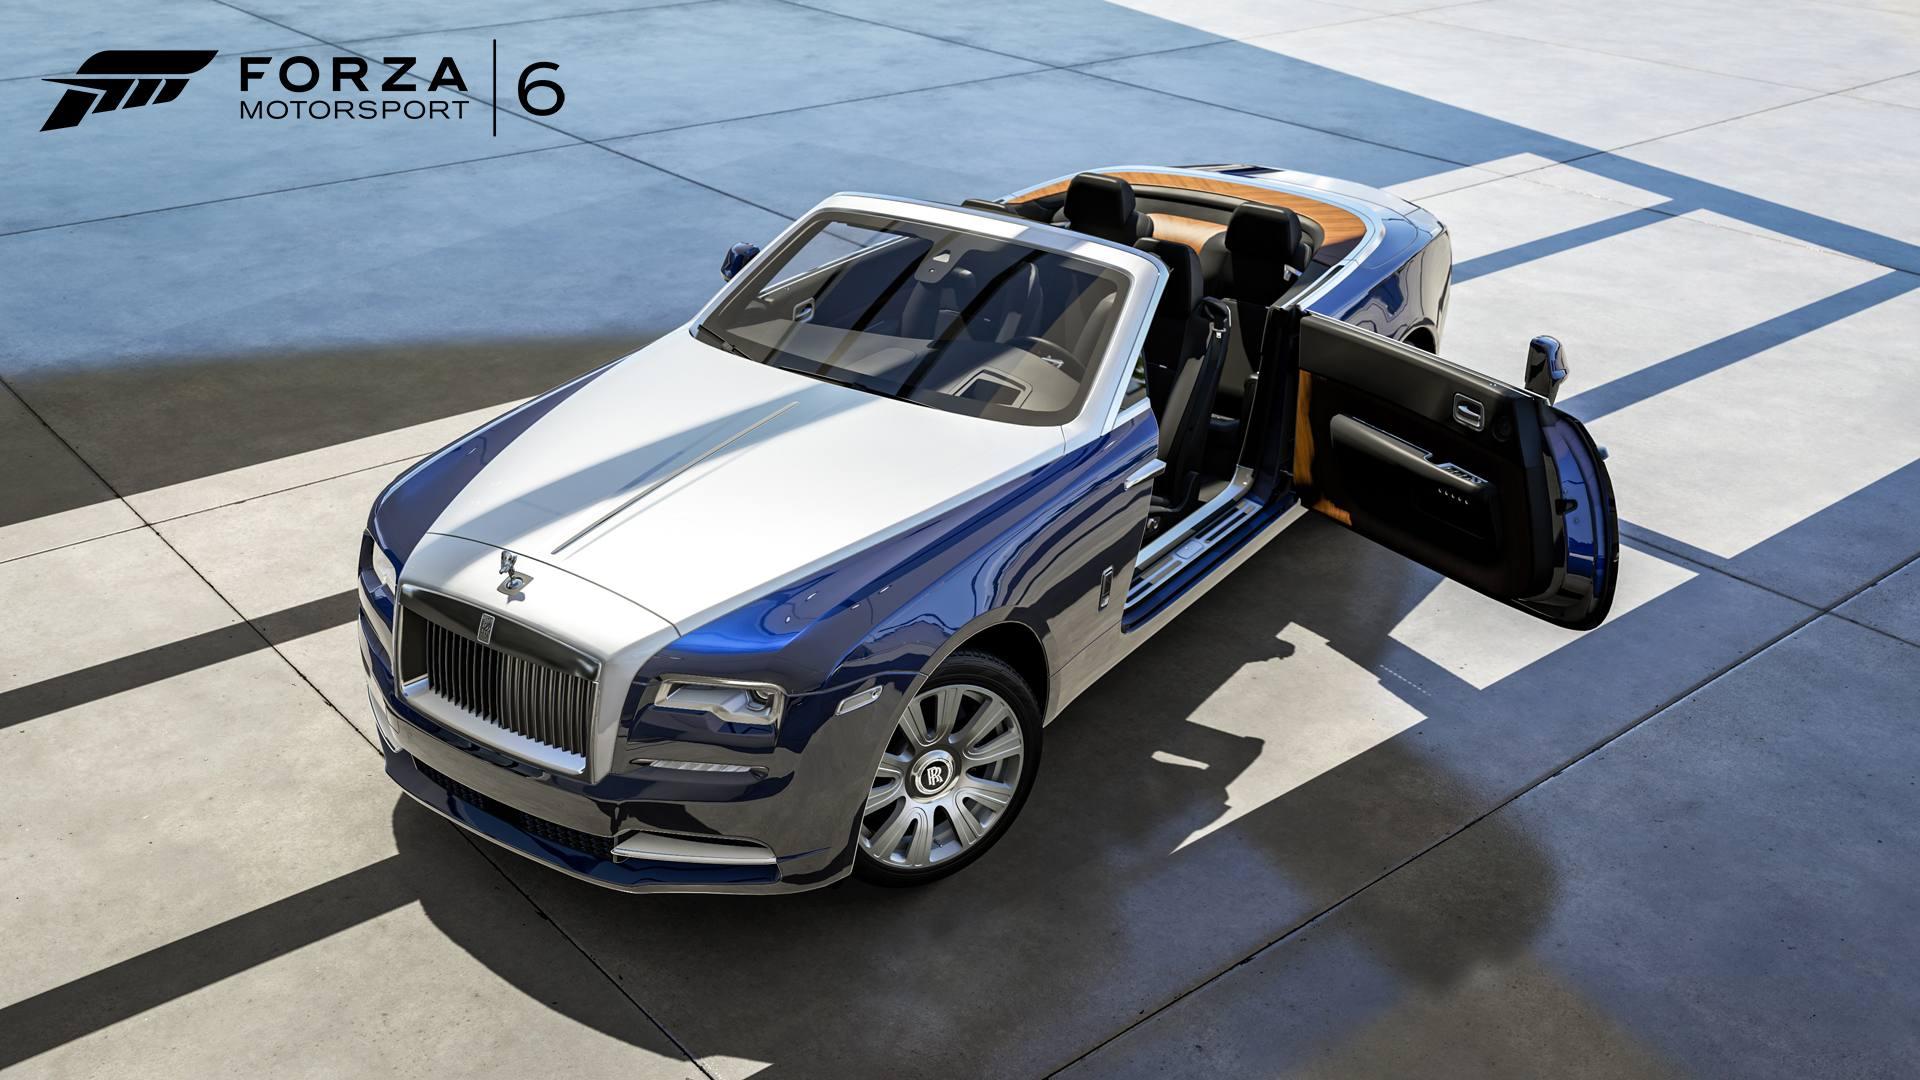 Forza Motorsport 6 2016 Rolls-Royce Dawn 05-04-16 001